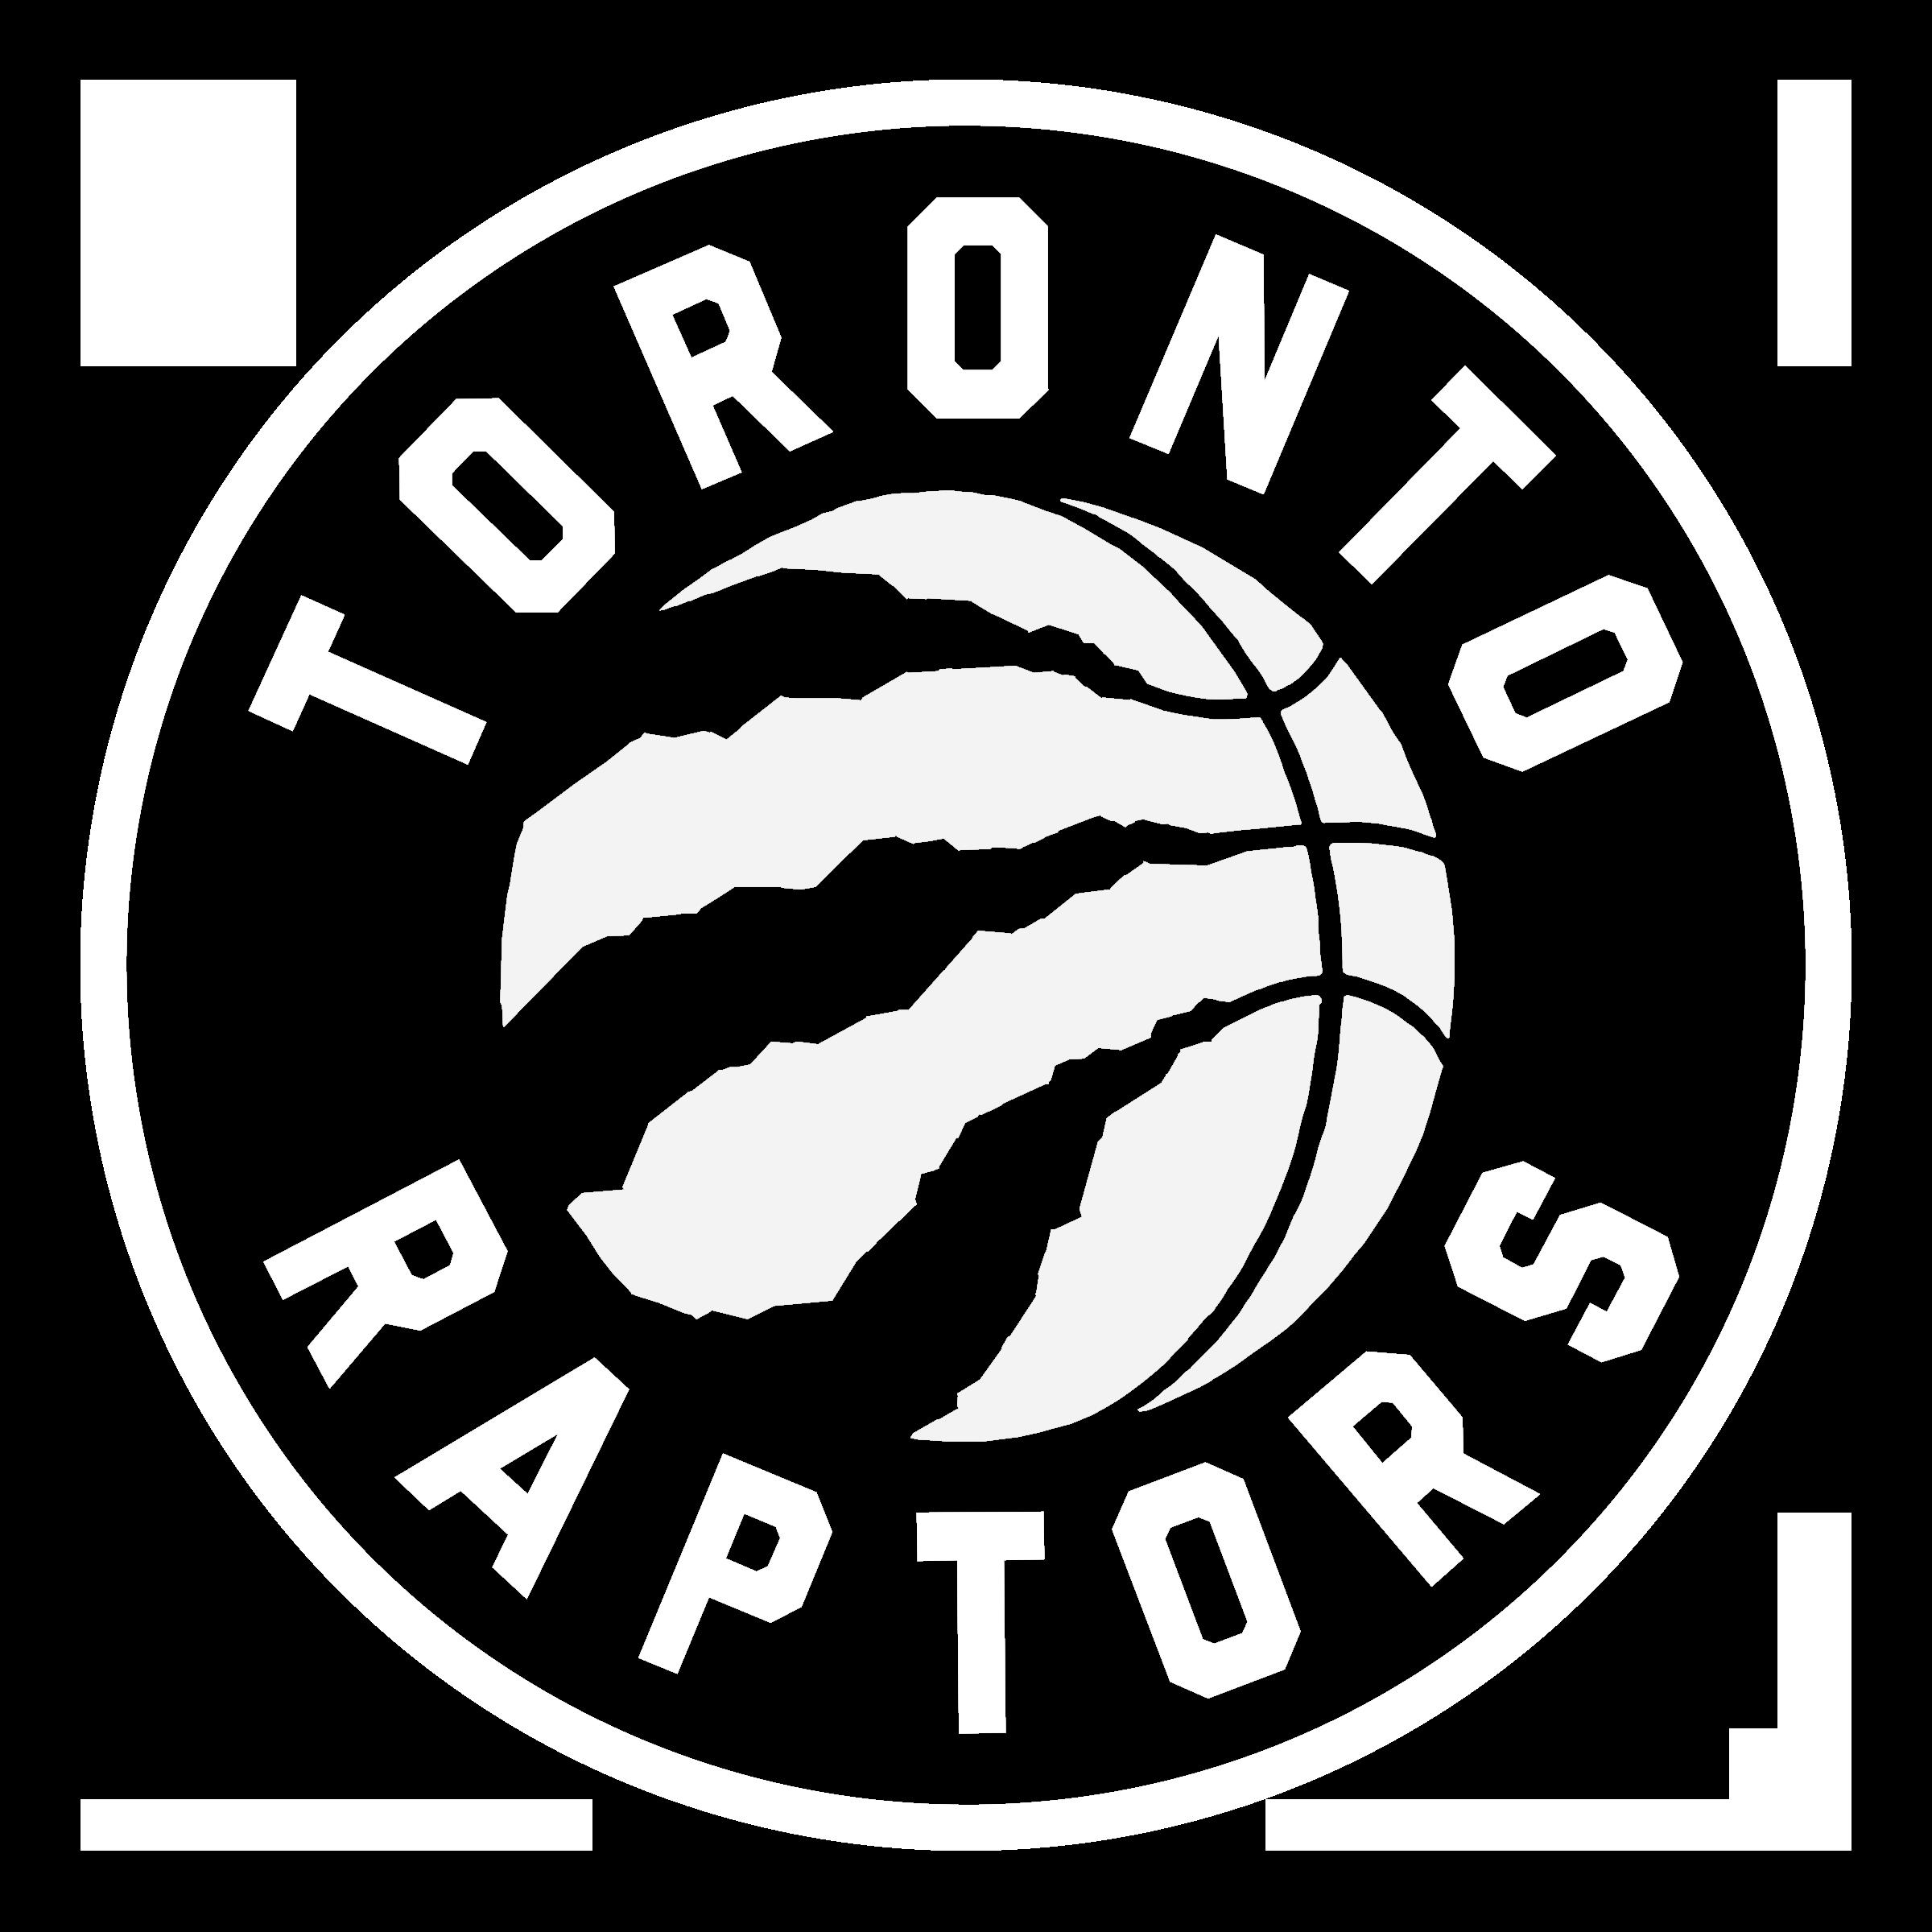 Toronto Raptors logo - Creative Partner client